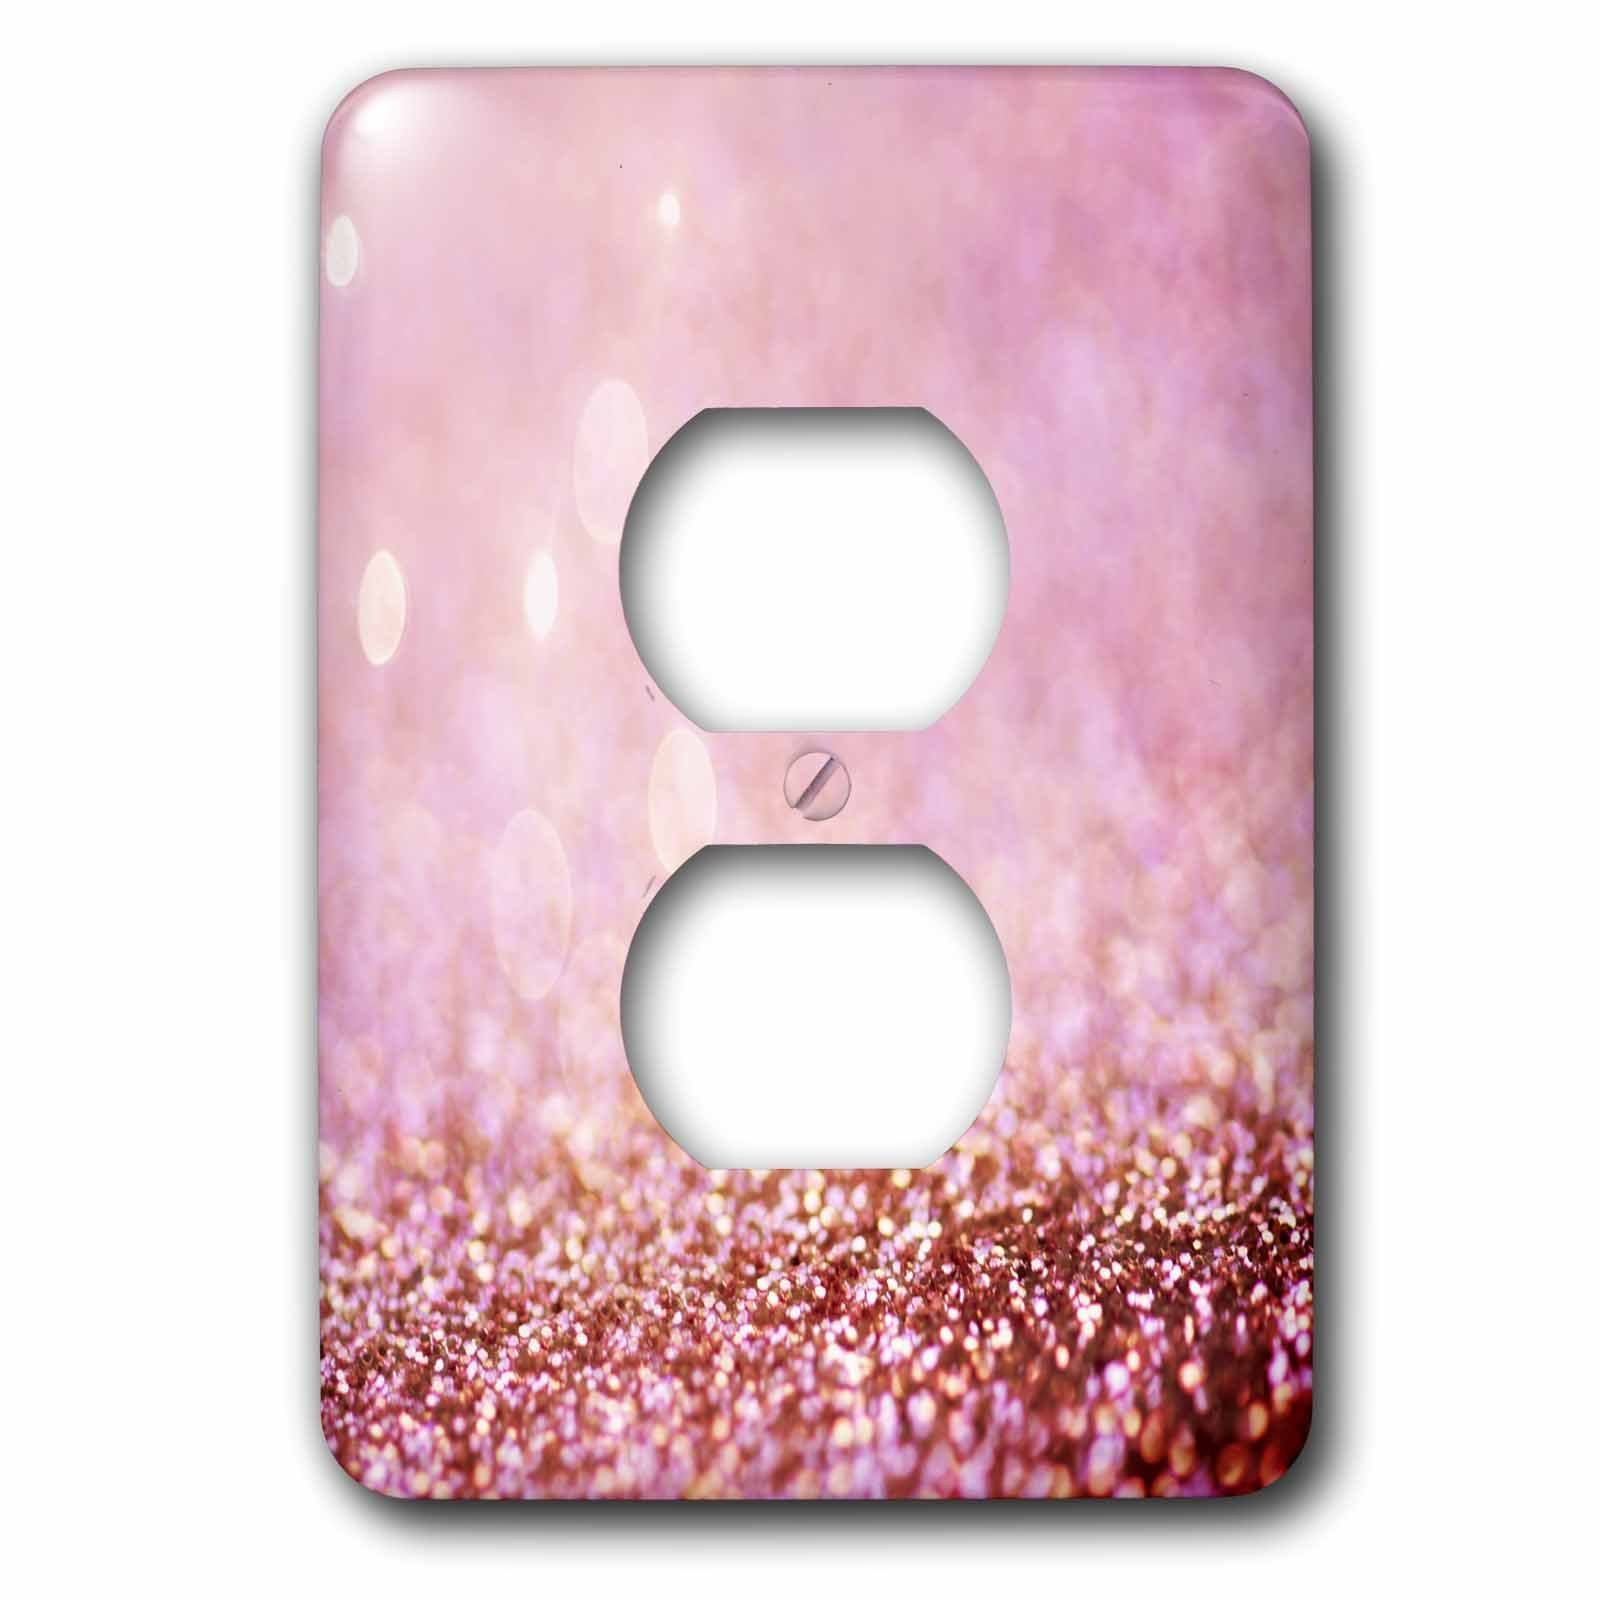 3dRose LSP_272846_6 Sparkling Rose Gold Pink Luxury Shine Girly Elegant Mermaid Glitter Plug Outlet Cover,